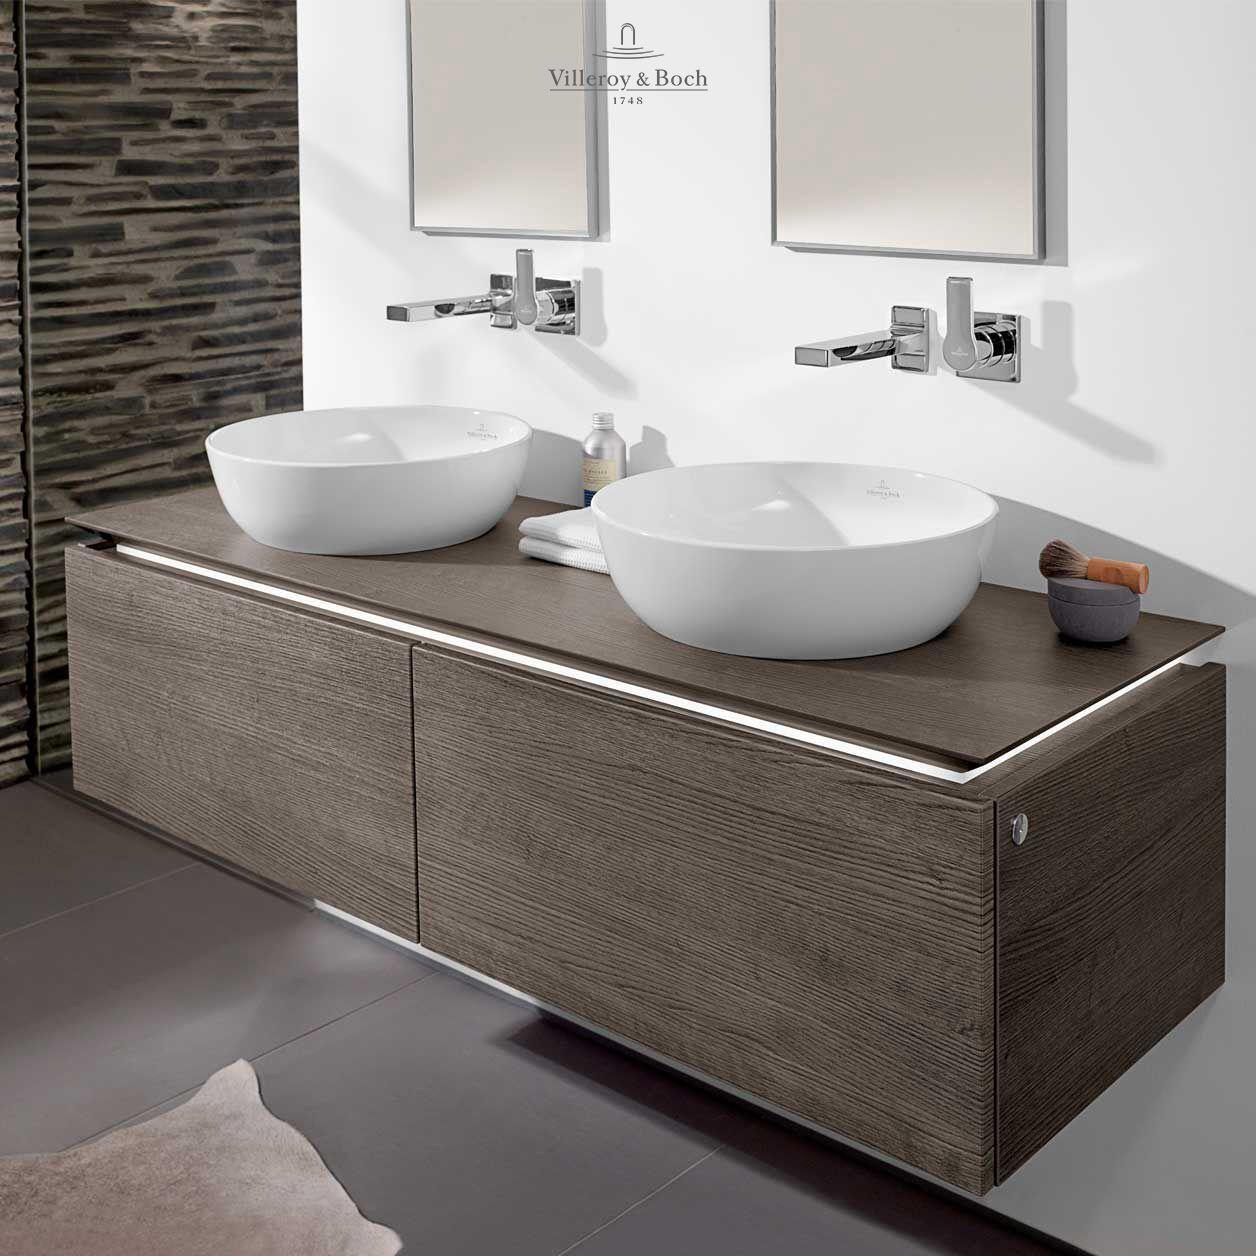 Oak Graphite Villeroy Boch Bathroom Furniture Bathroom Planner